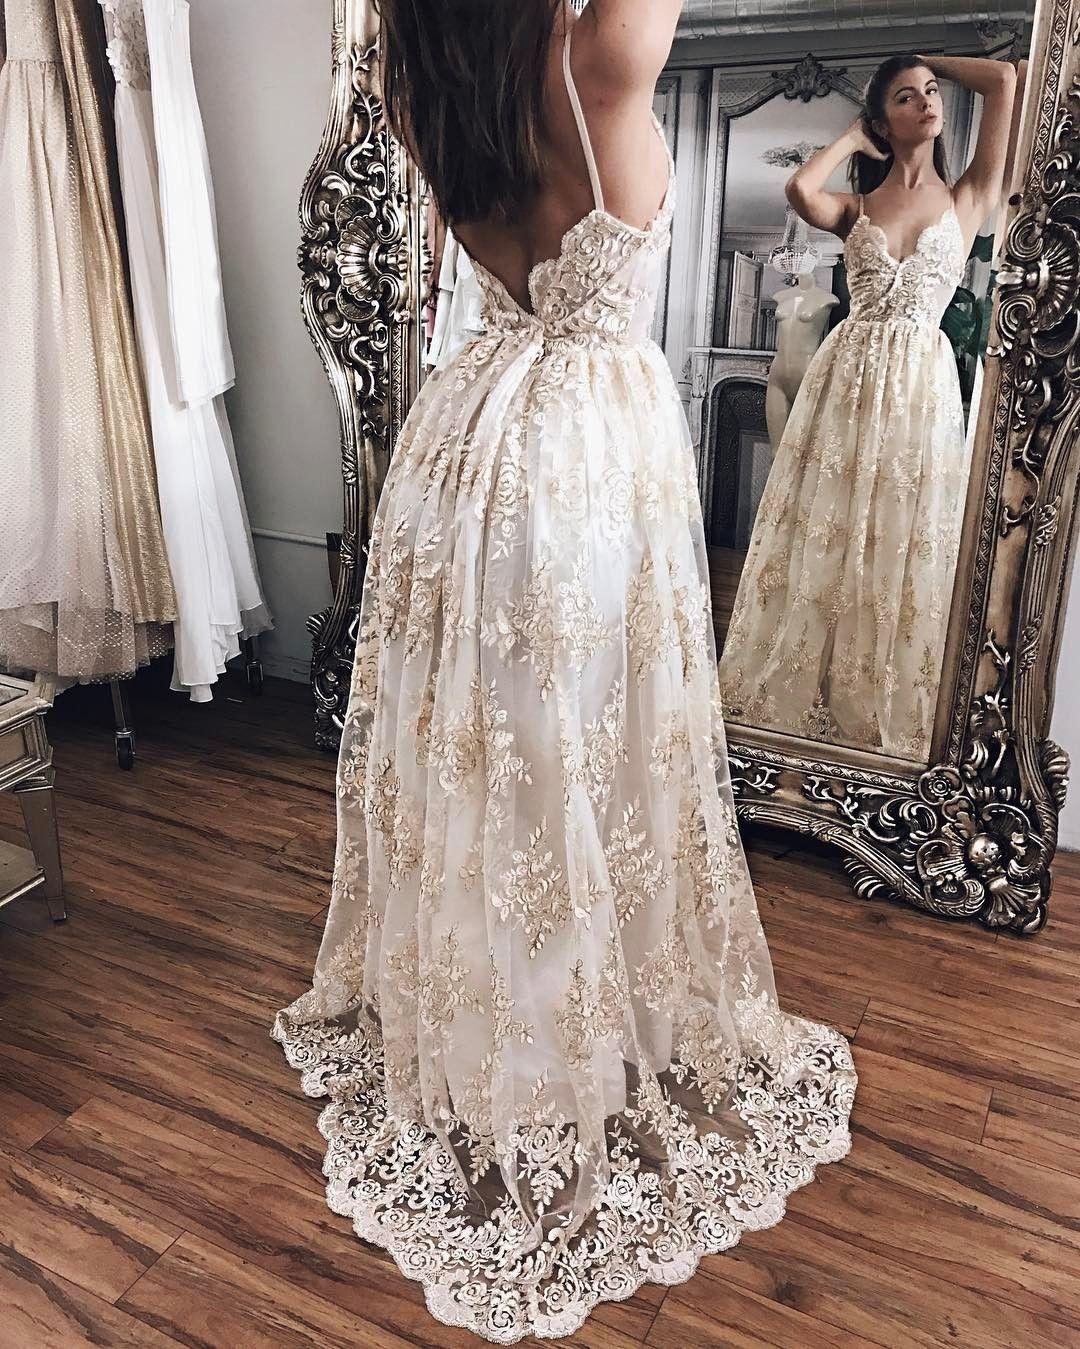 Ivory outdoor countryside boho beach wedding dress with dream